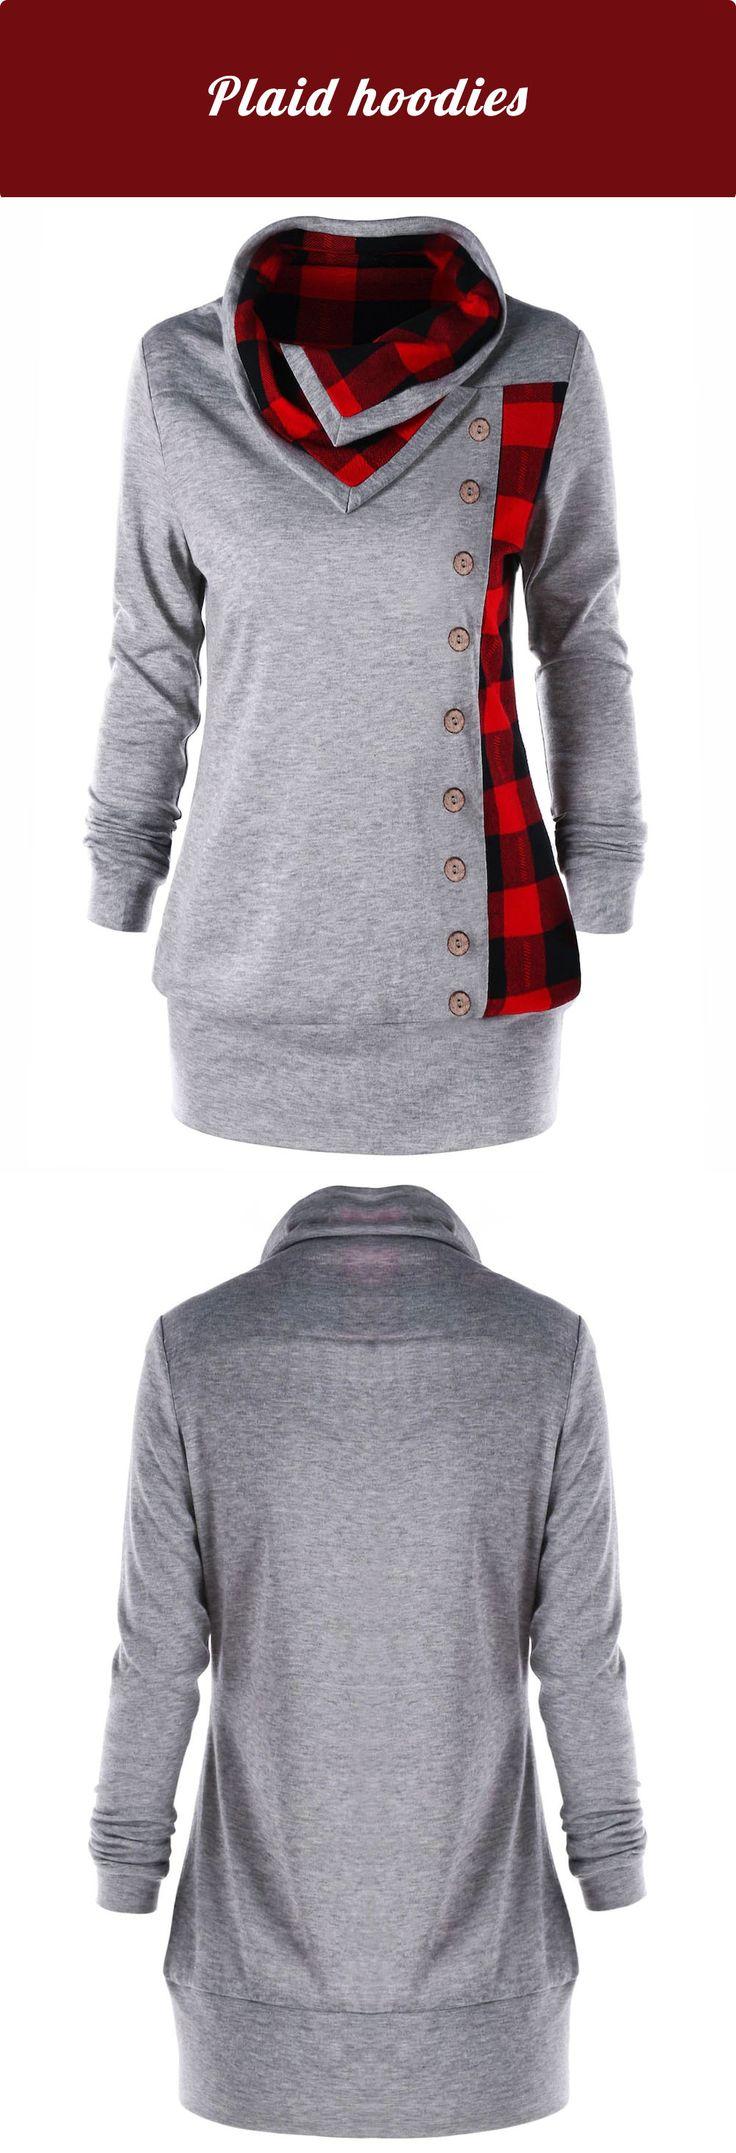 $11.11,Plus Size Plaid Cowl Neck Sweatshirt - Heather Gray 3Xl | Rosewholesale,rosewholesale.com,rosewholesale clothes,rosewholesale.com clothing,rosewholesale plus size,rosewholesale plus size tops,rosewholesale dress plus size,plus size hoodies and sweatshirts,plaid hoodies,plus size,tops,blouses,hoodies | #rosewholesale #hoodies  #plussize #tops